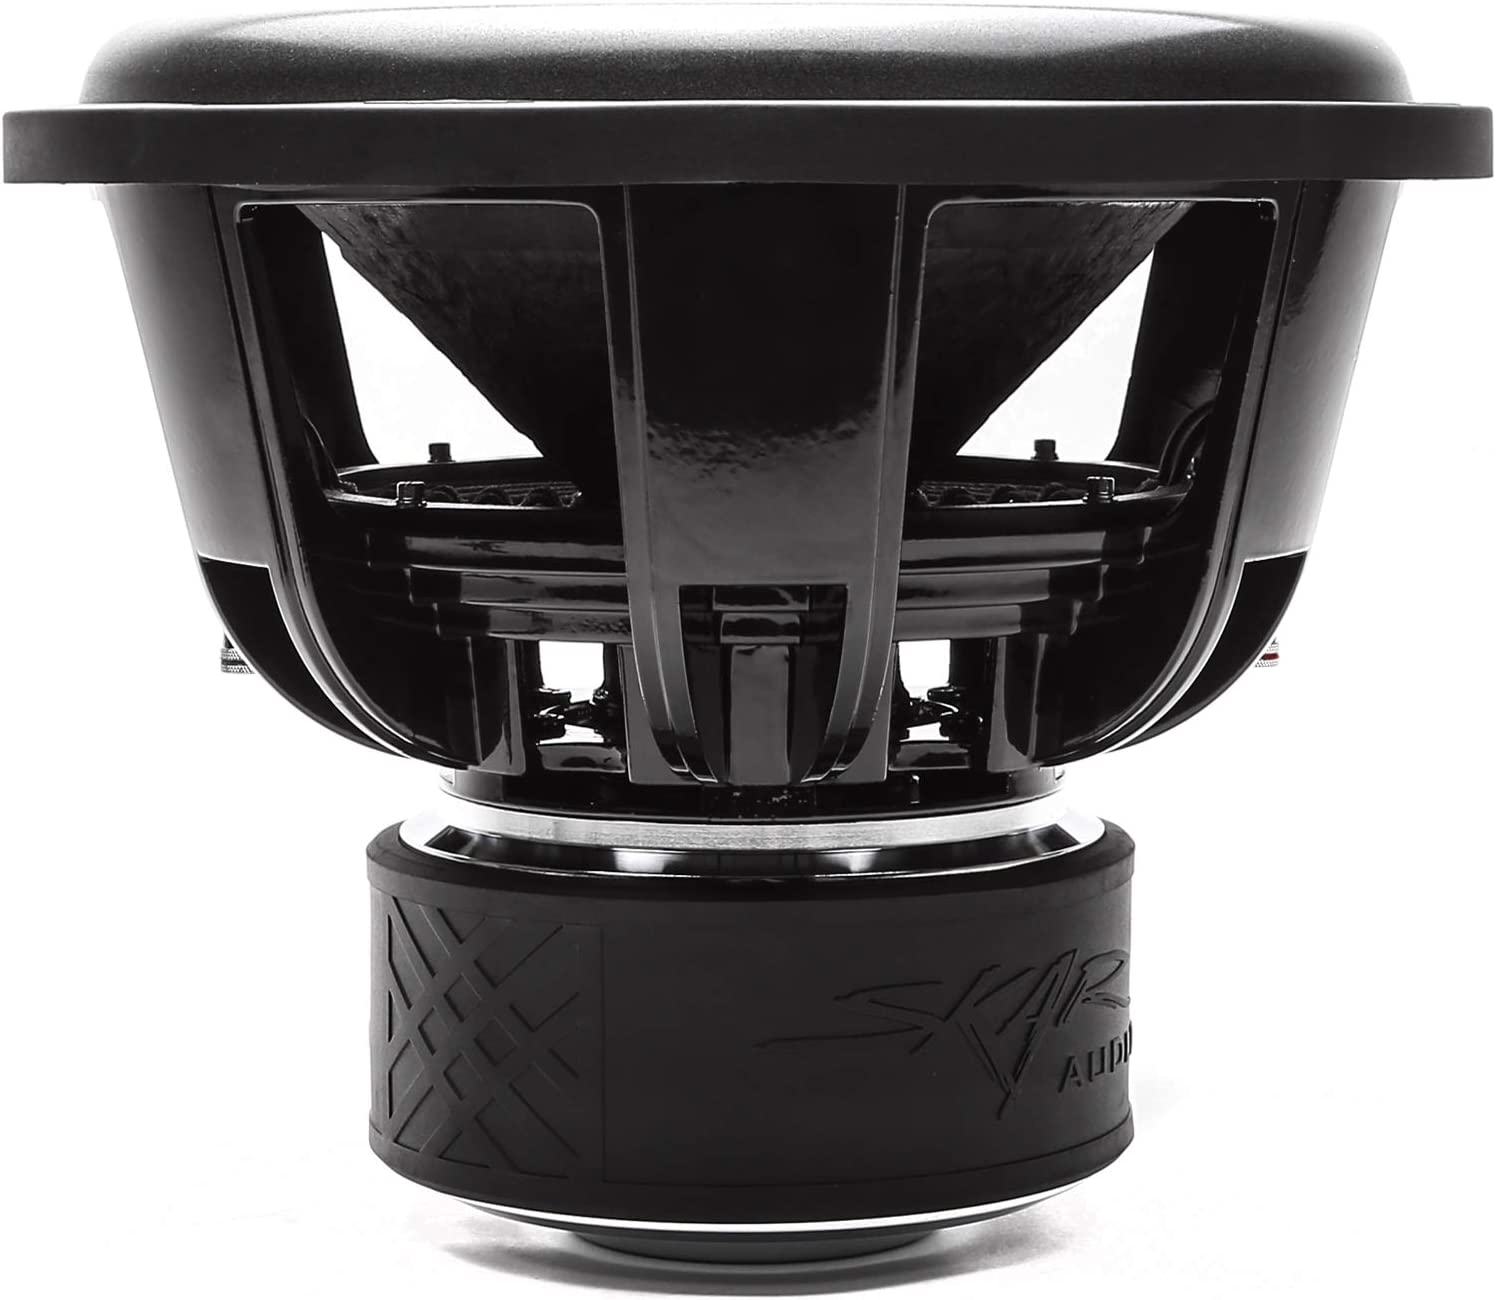 Skar Audio ZVX-15v2 15 1500 Watt RMS Dual 1 Ohm Subwoofer